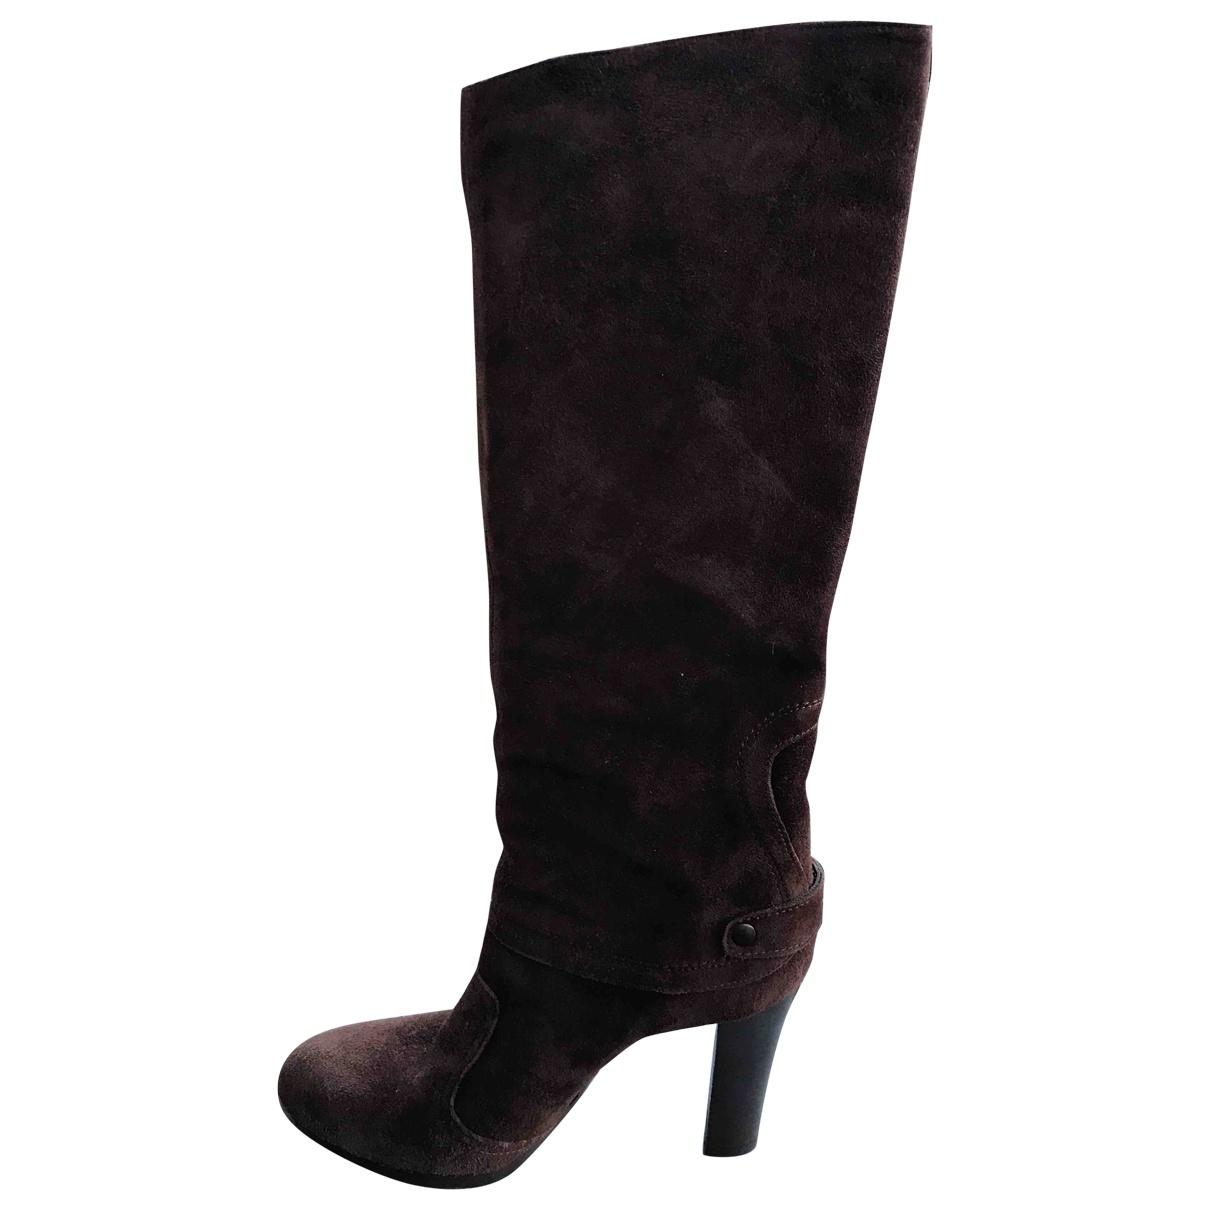 Vic Matié N Brown Suede Boots for Women 35 EU